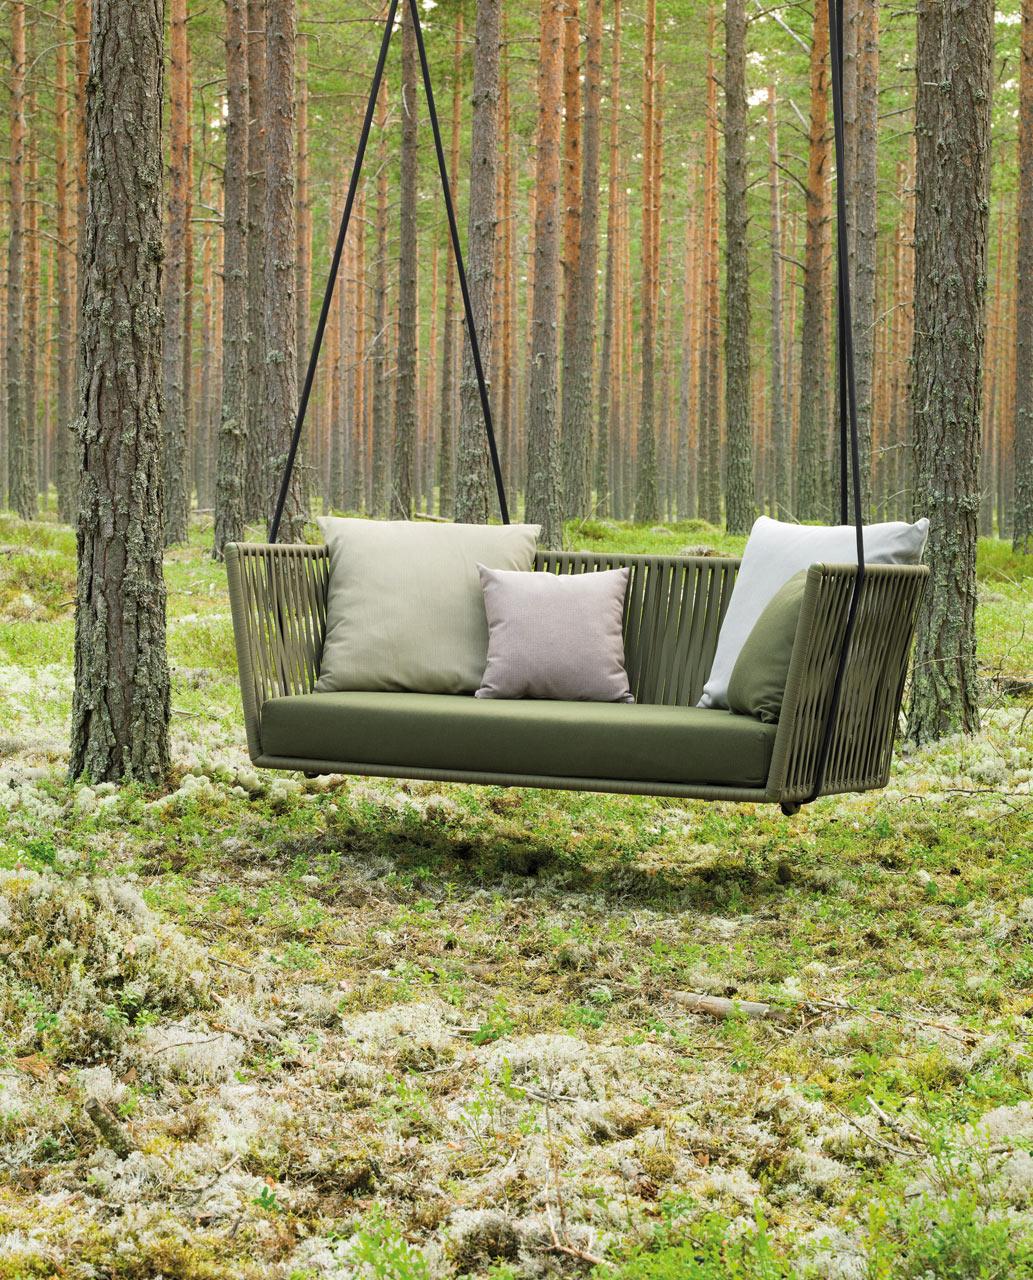 Braided Outdoor Furniture By Rodolfo Dordoni For Kettal ...